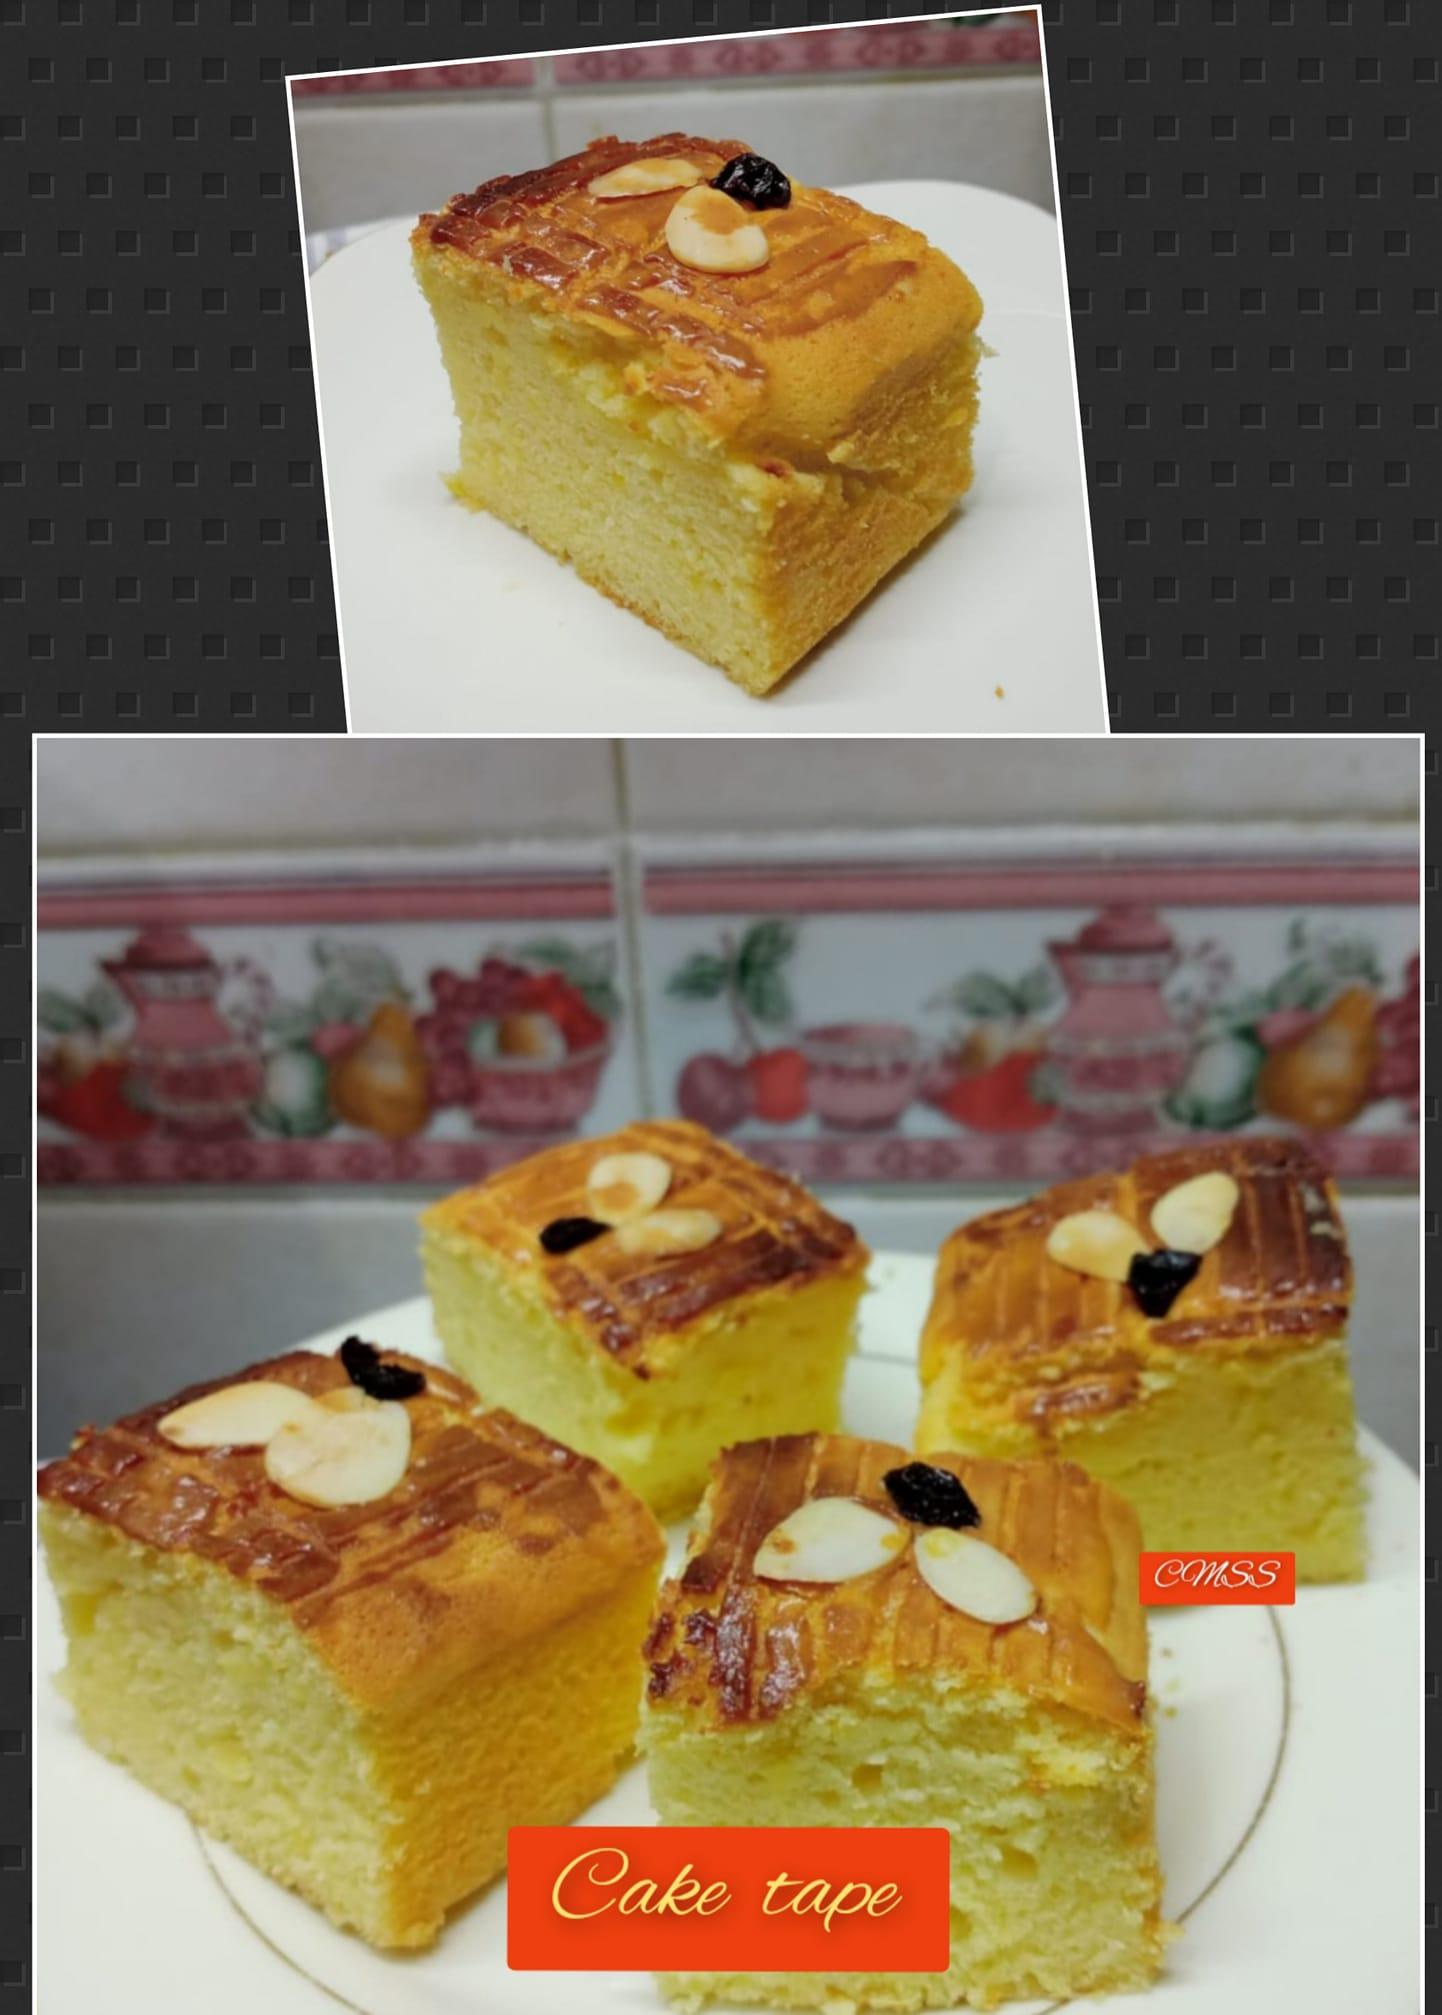 resep CAKE TAPE by Catharina Maria Sri Sumarti